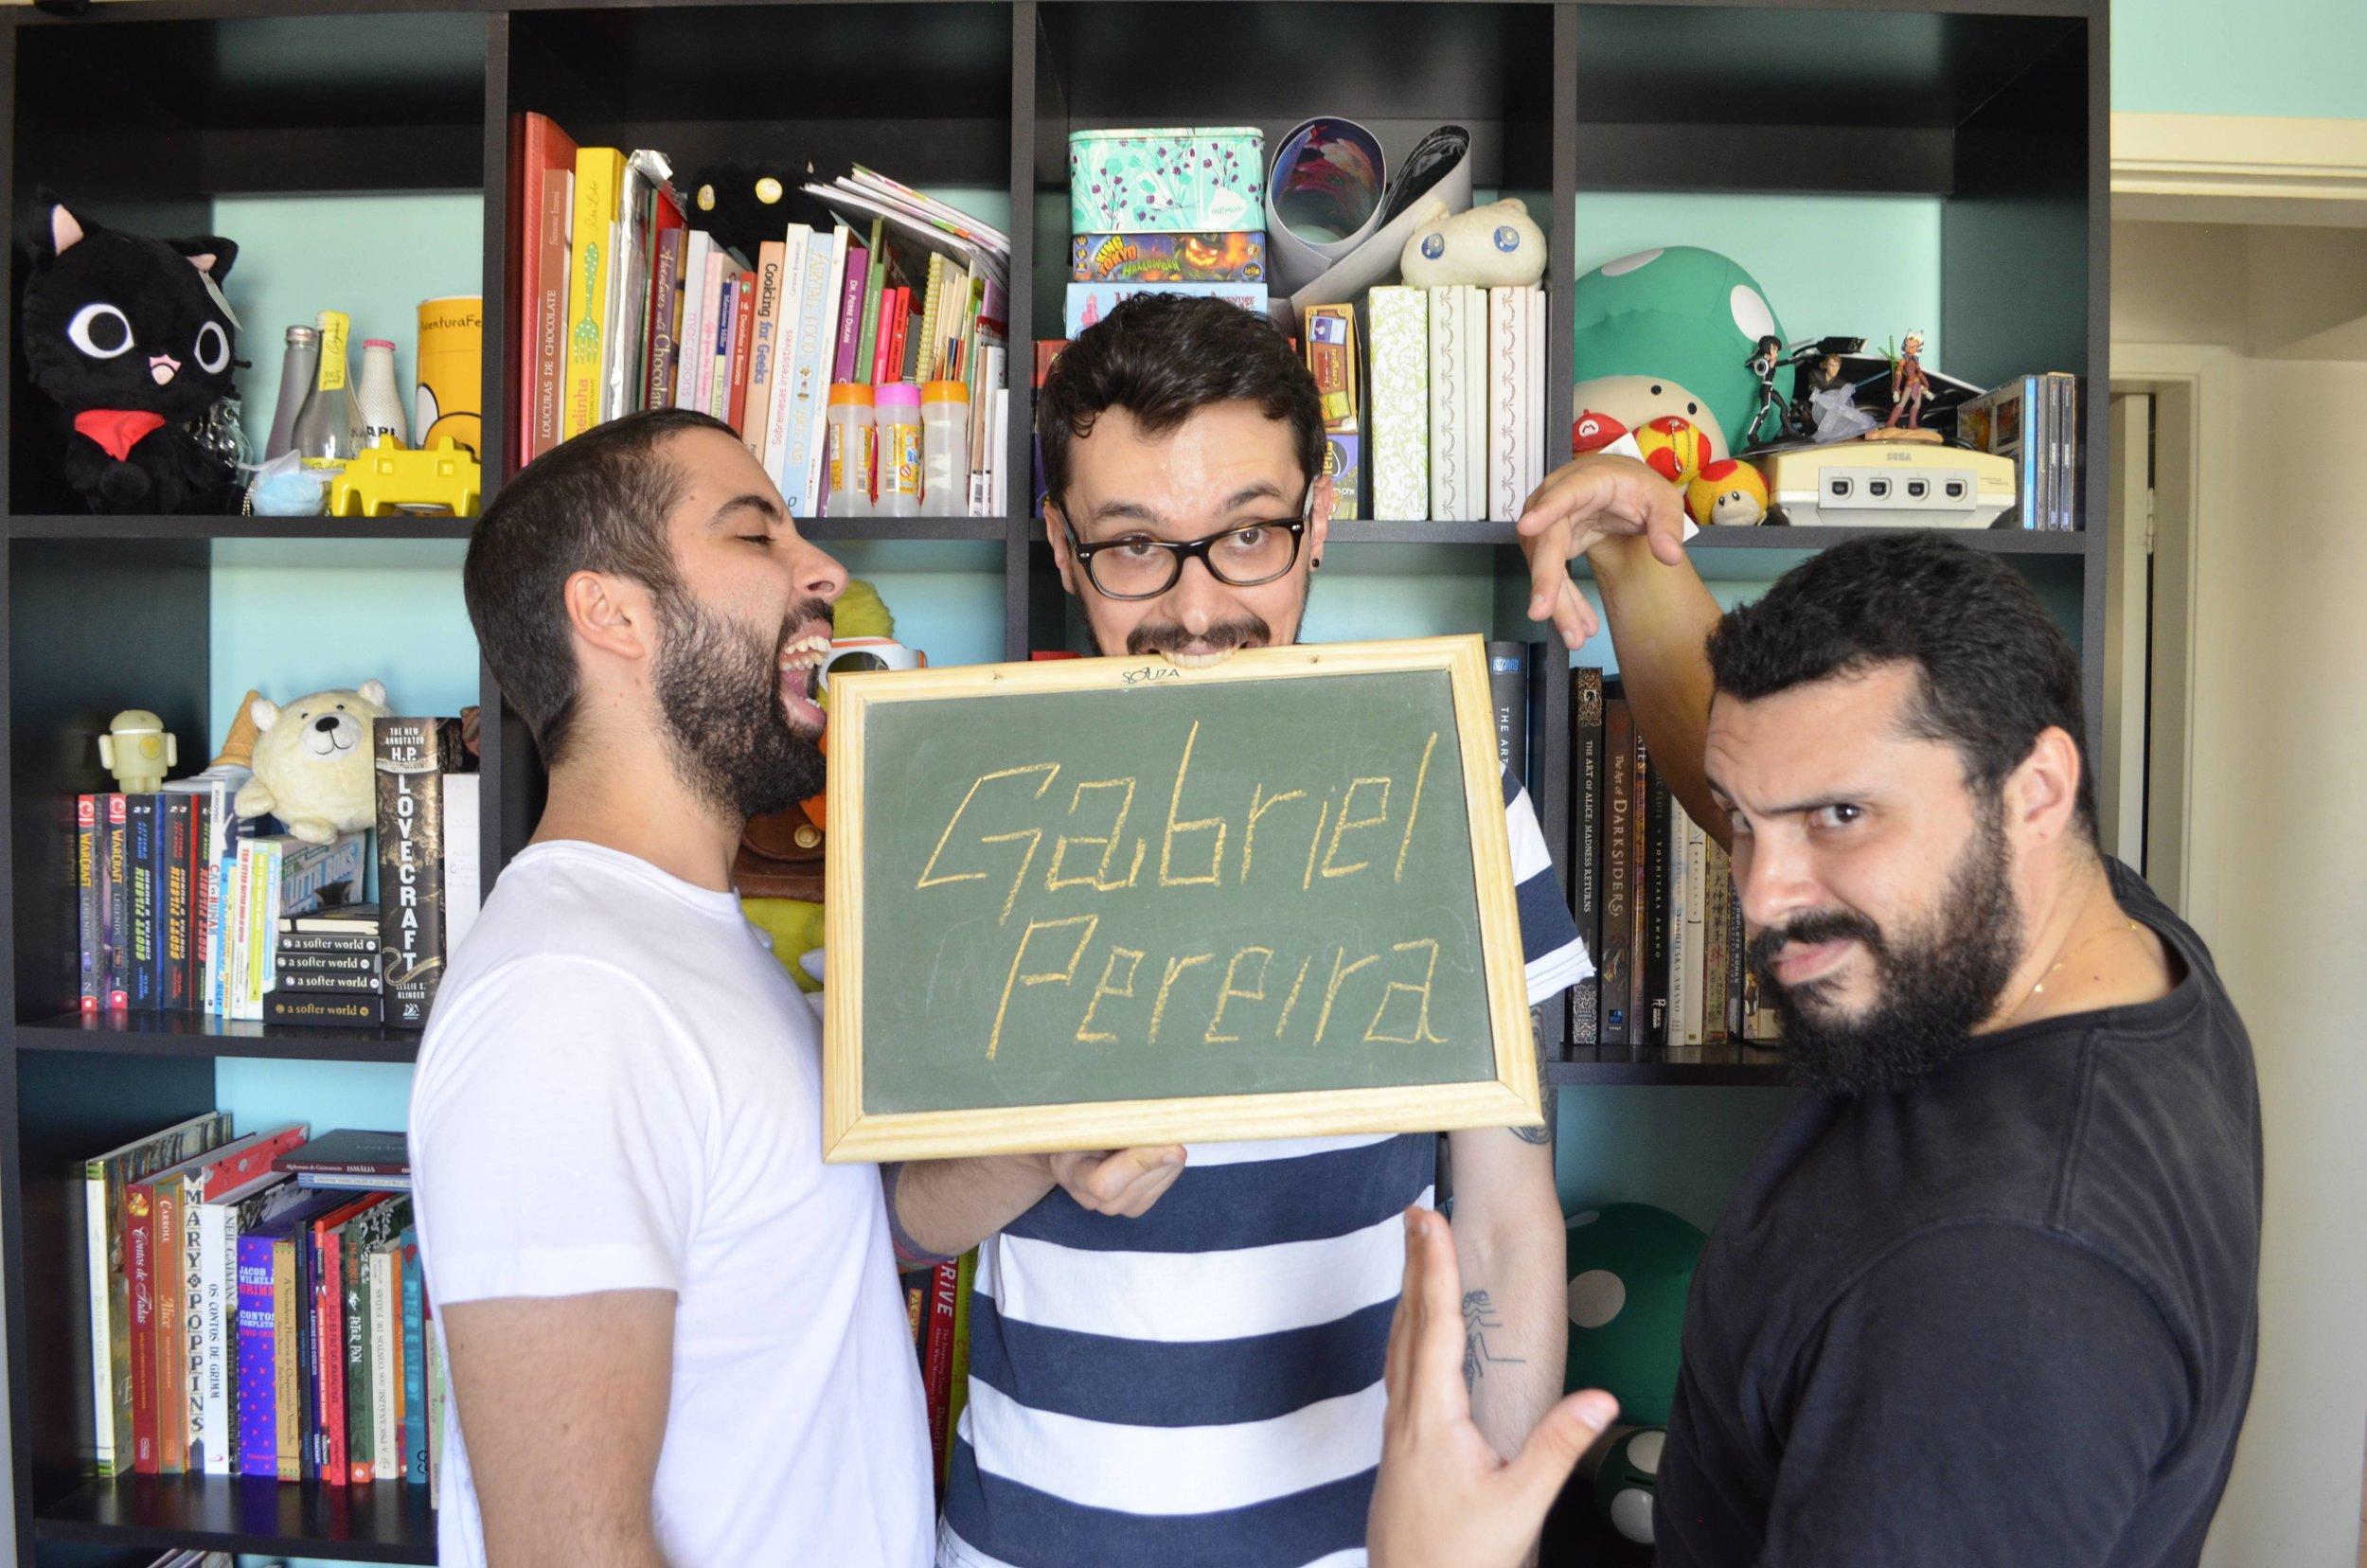 Gabriel-Pereira.jpg